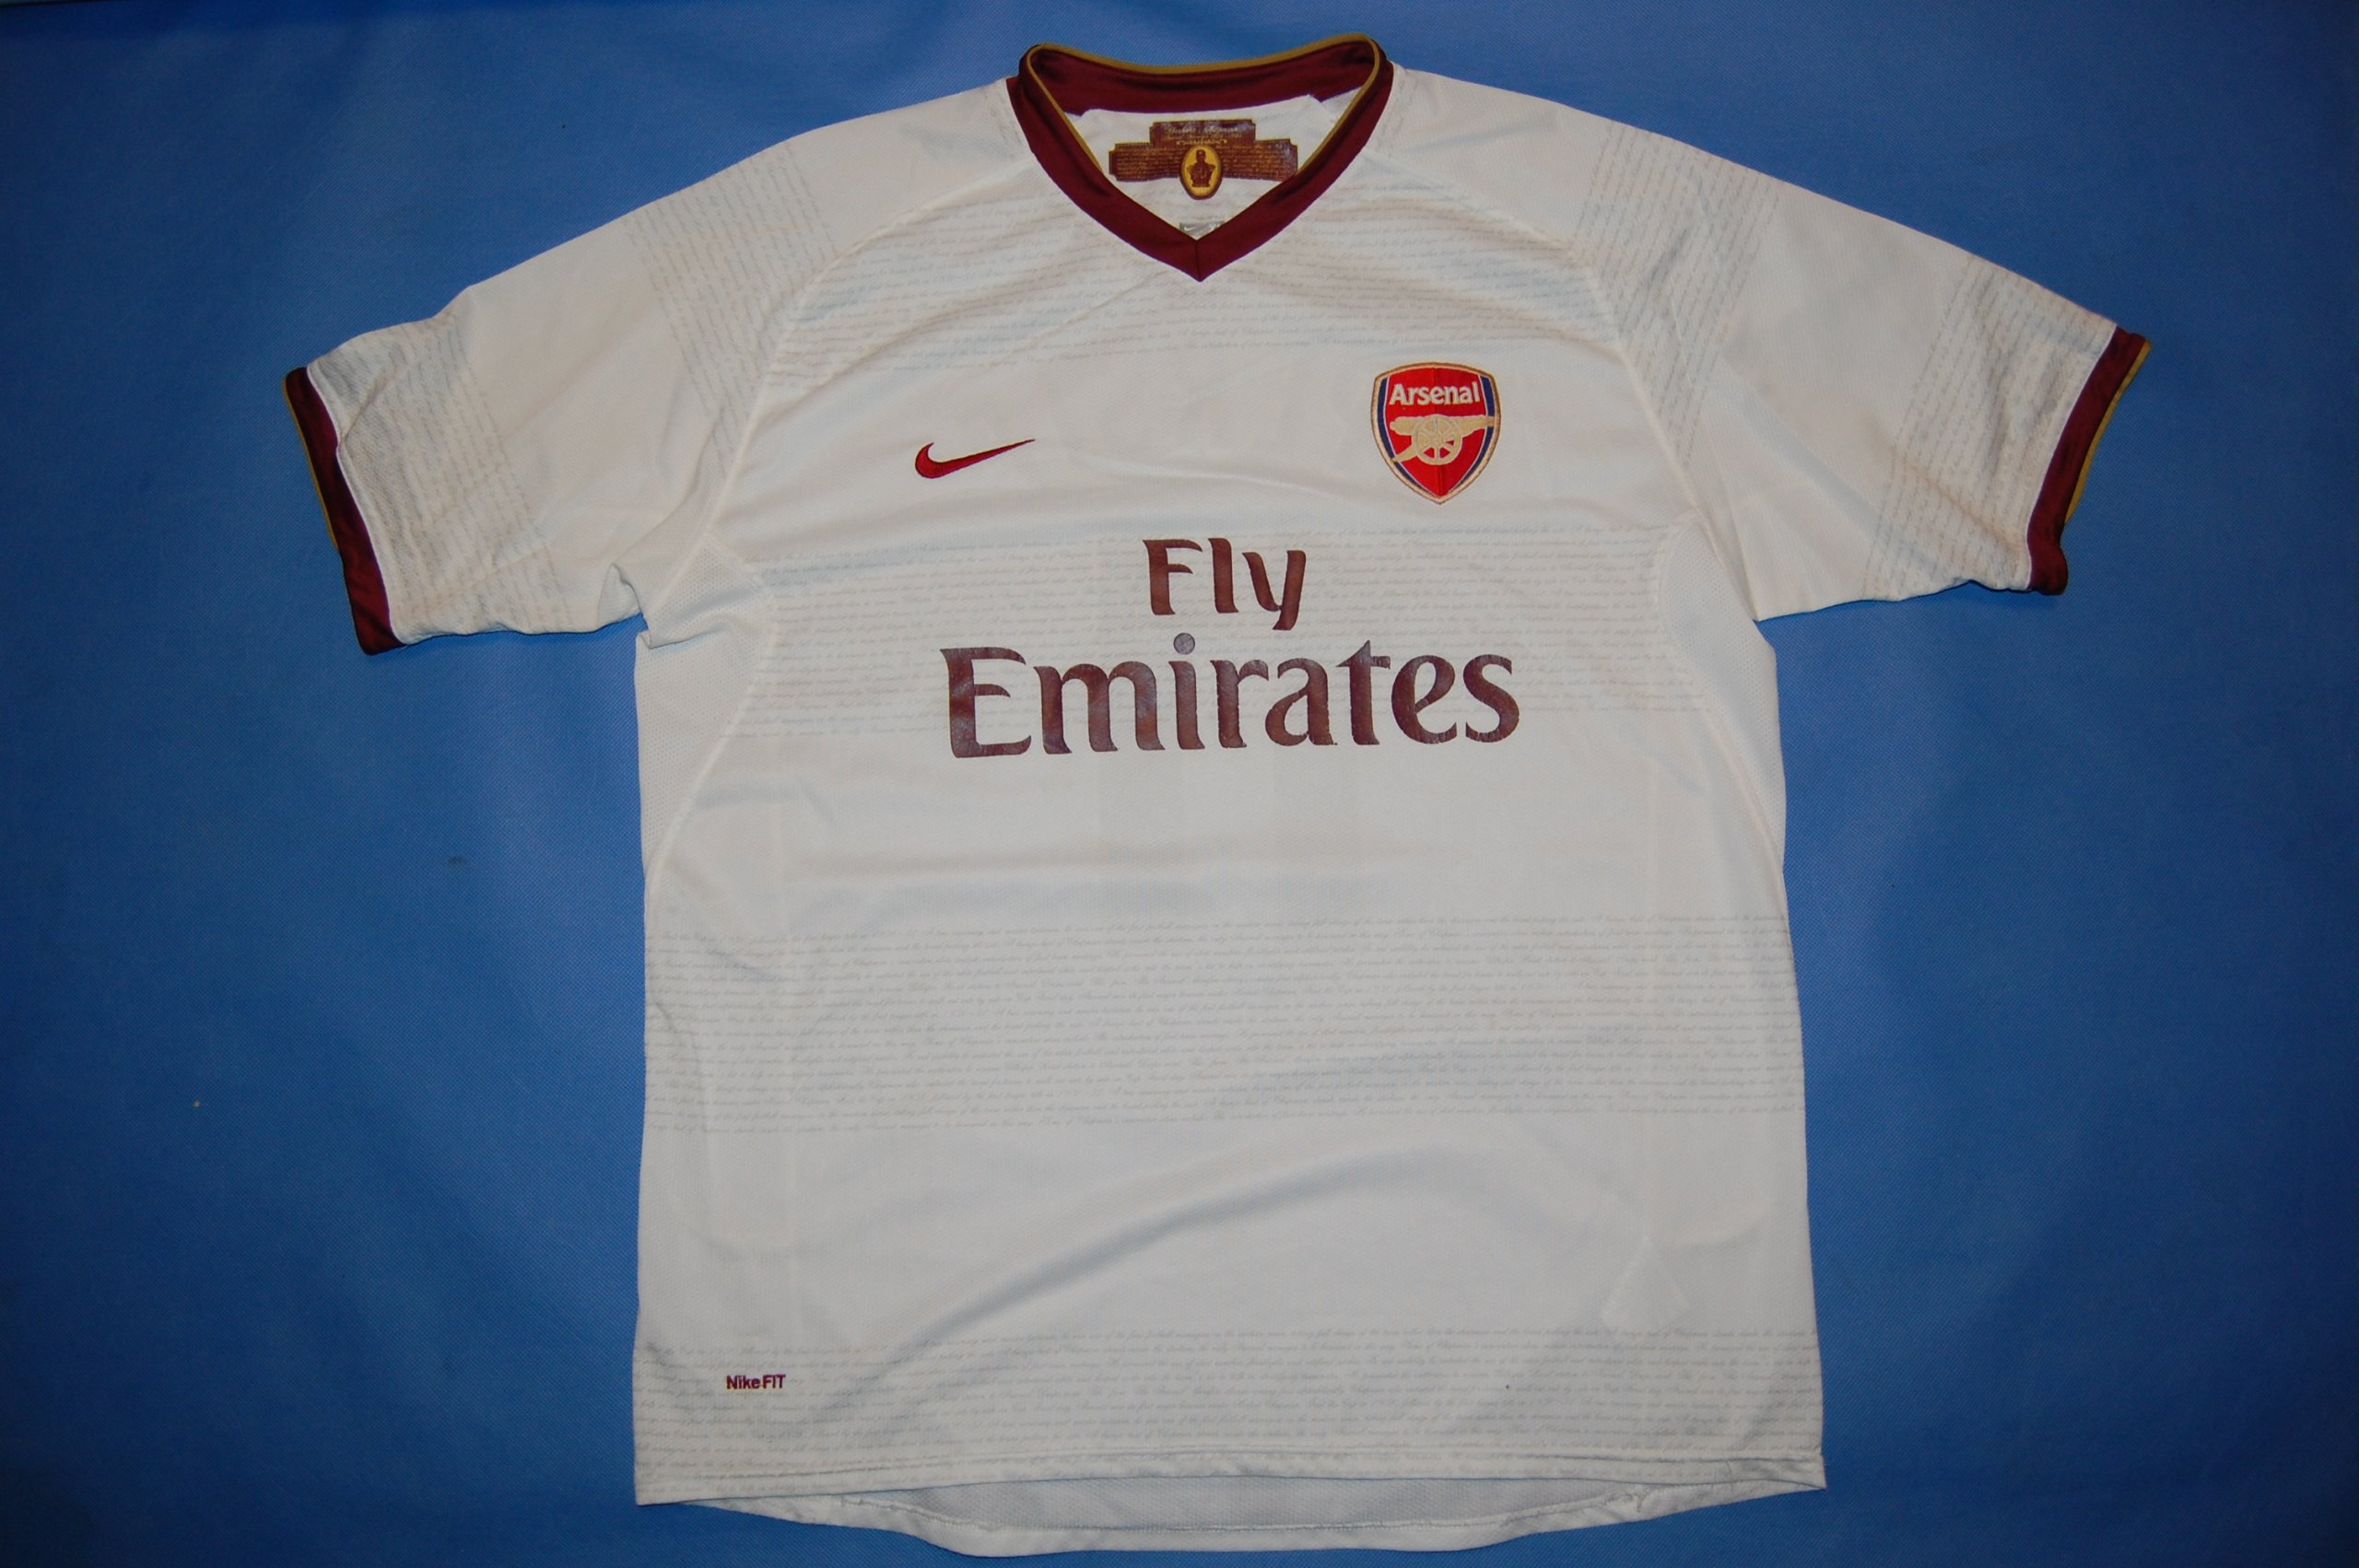 c56998162 Koszulka Nike Arsenal London FC V.PERSIE | XL - 7050730663 ...